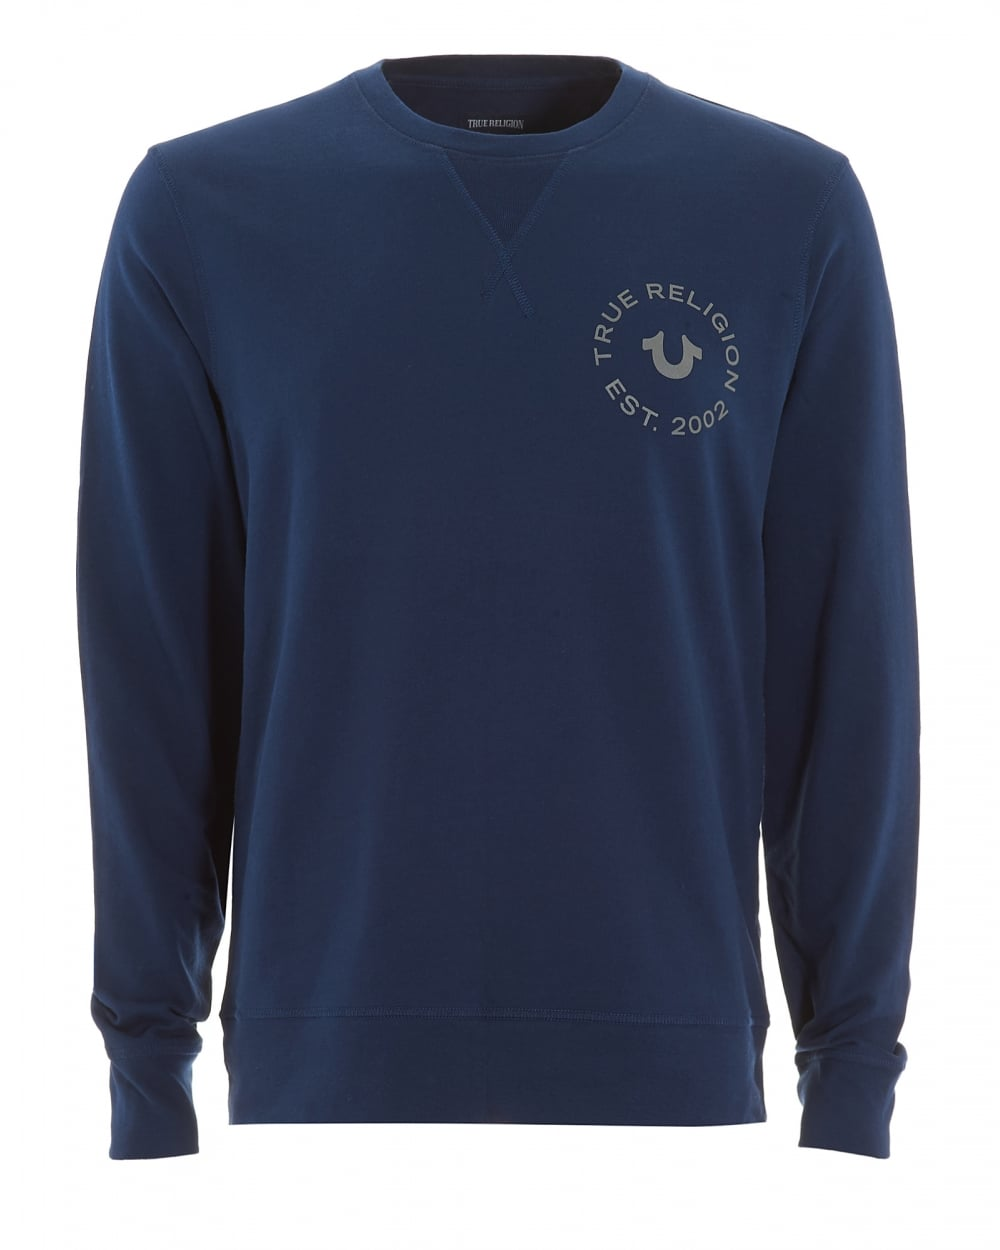 True Religion Jeans Mens Large Horseshoe Logo Navy Blue Sweatshirt 68d38f2f703